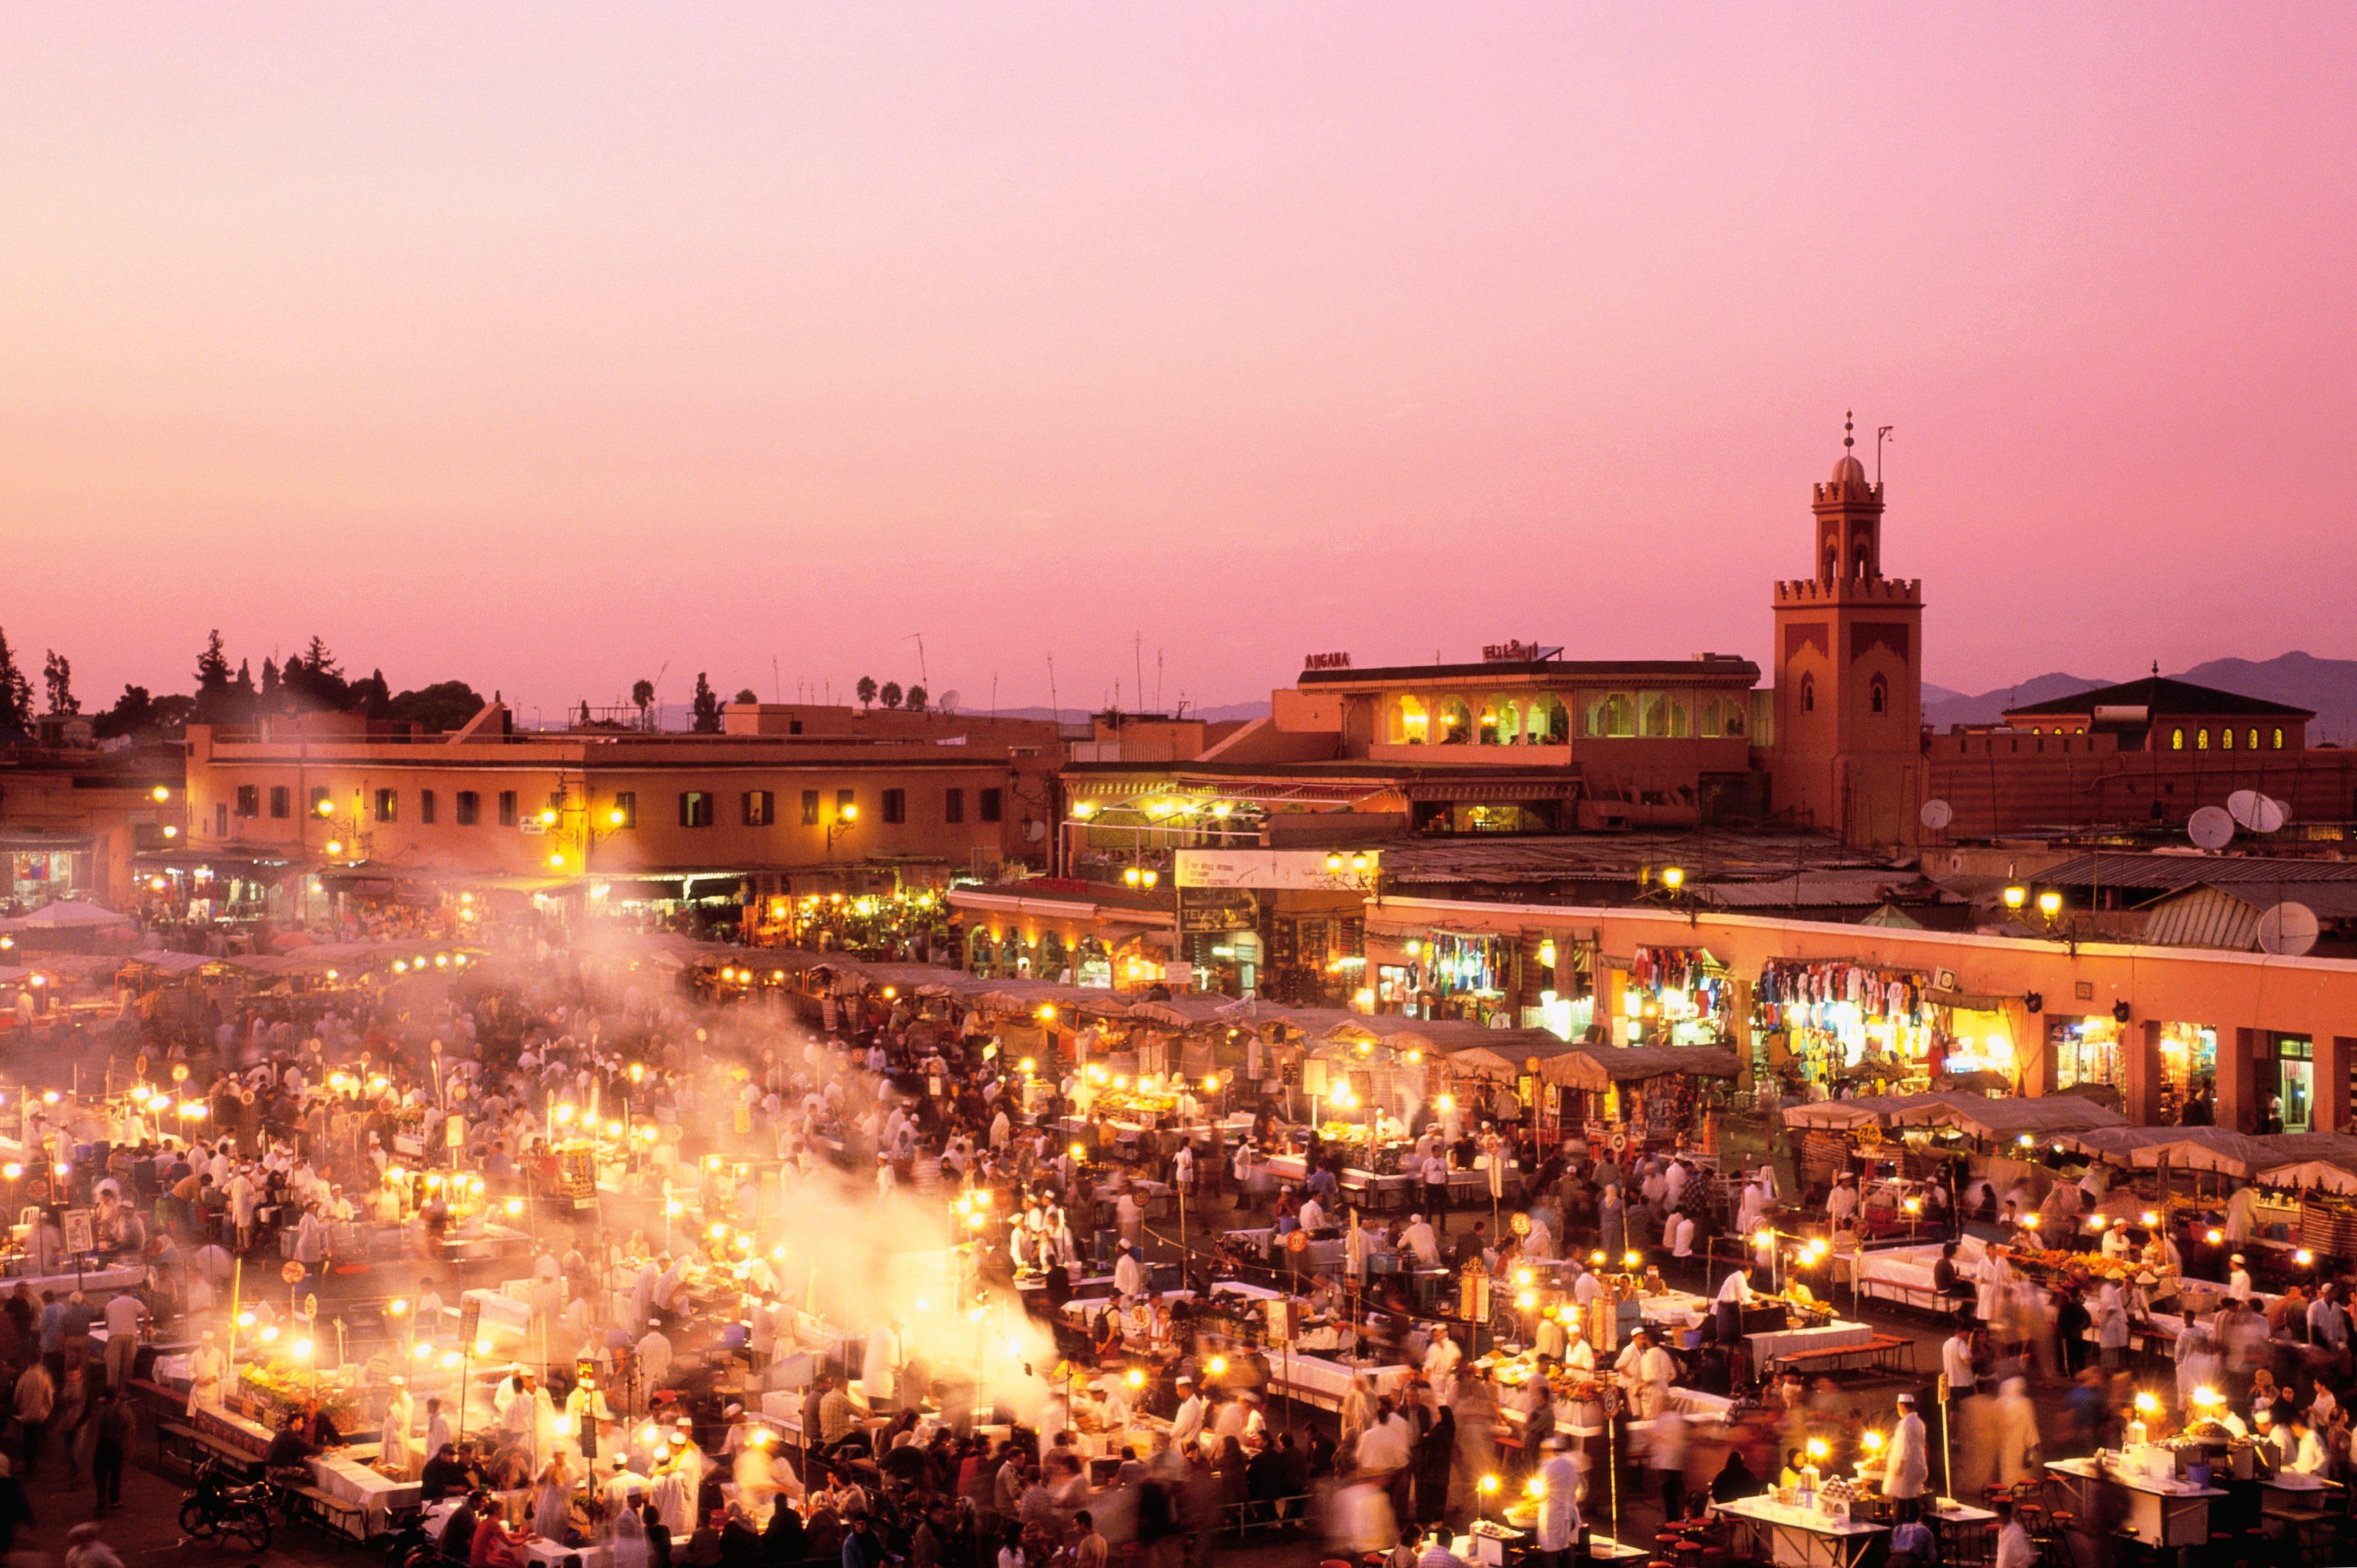 The illuminated Medina marketplace in Marrakech under a coral-hued sky